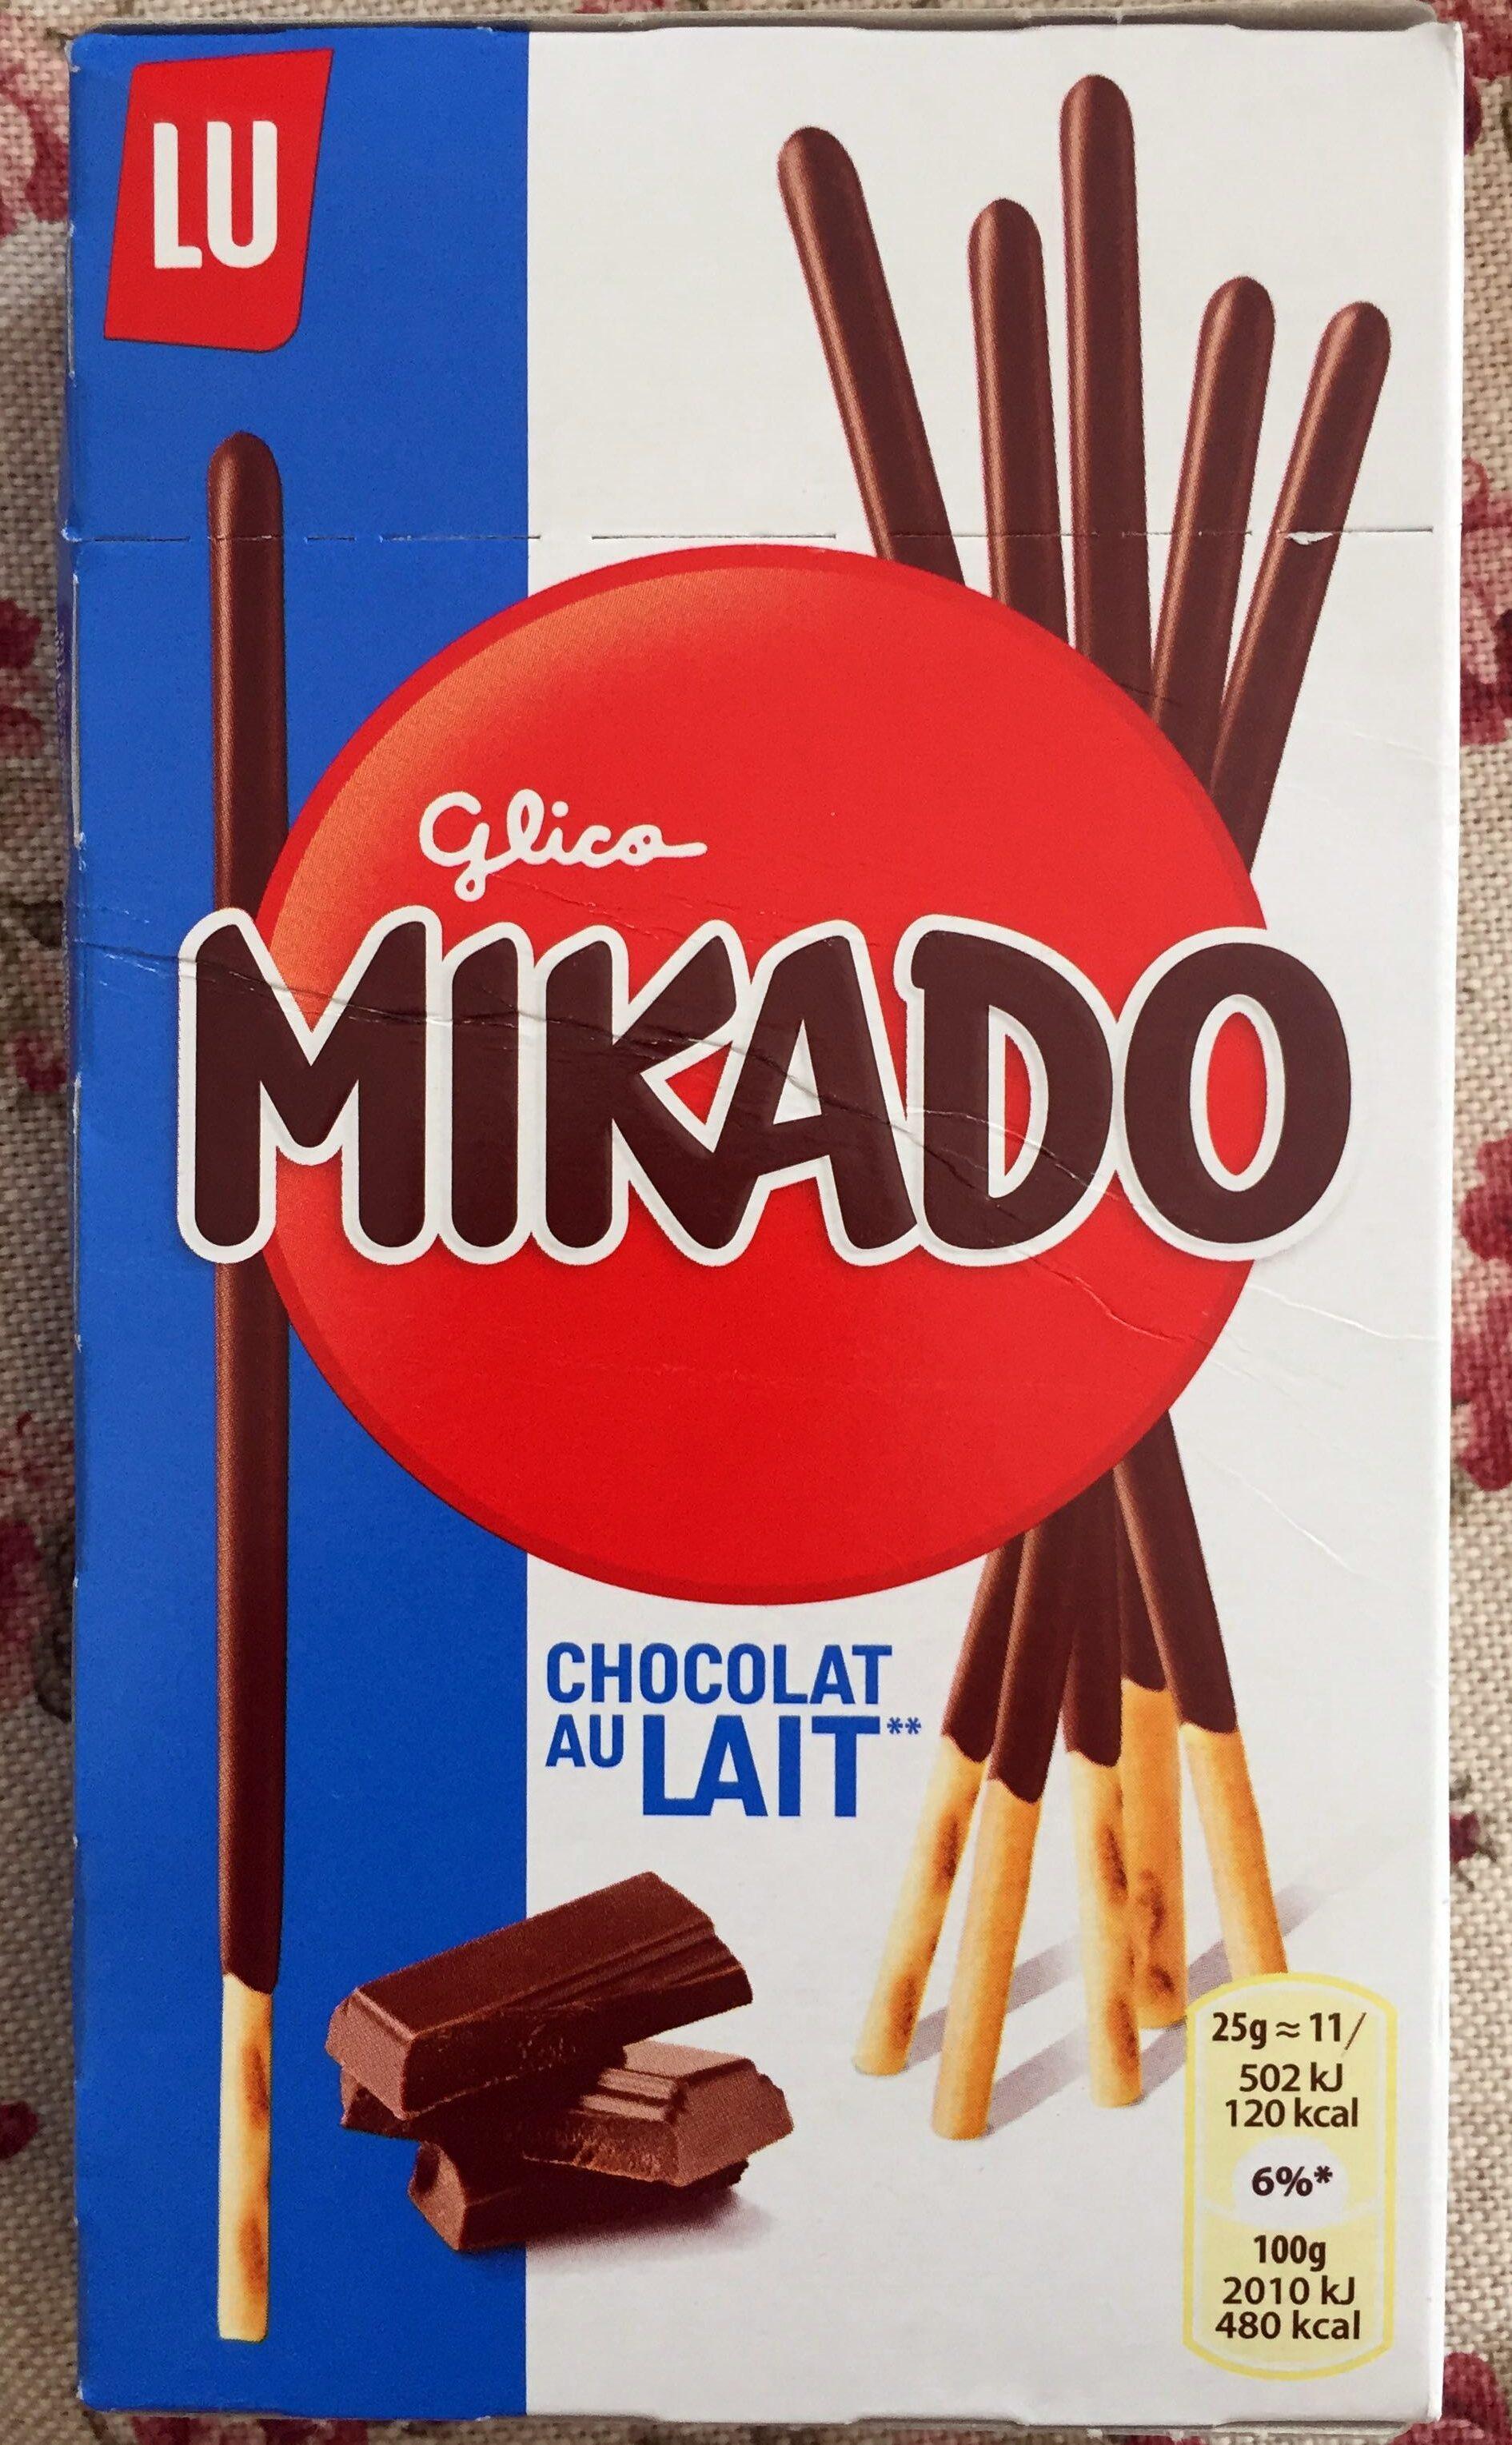 Mikado chocolat au lait - Prodotto - it